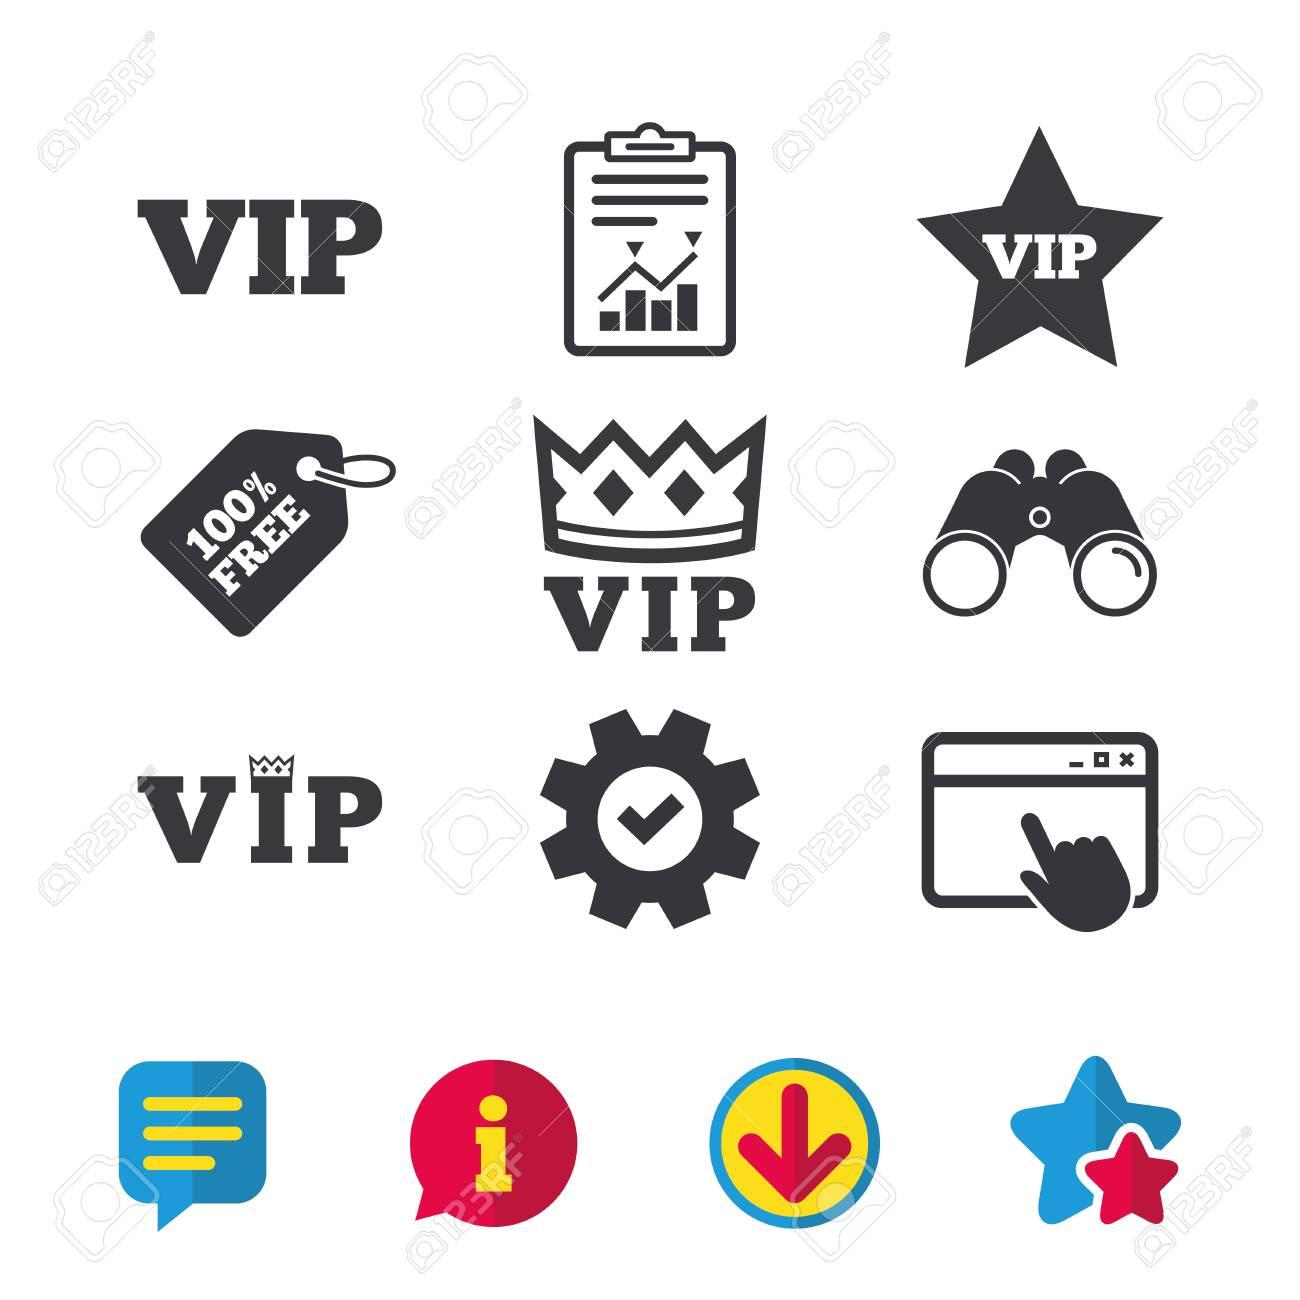 Star symbol keyboard choice image symbol and sign ideas stars keyboard symbol choice image symbol and sign ideas stars copy and paste symbols gallery symbol buycottarizona